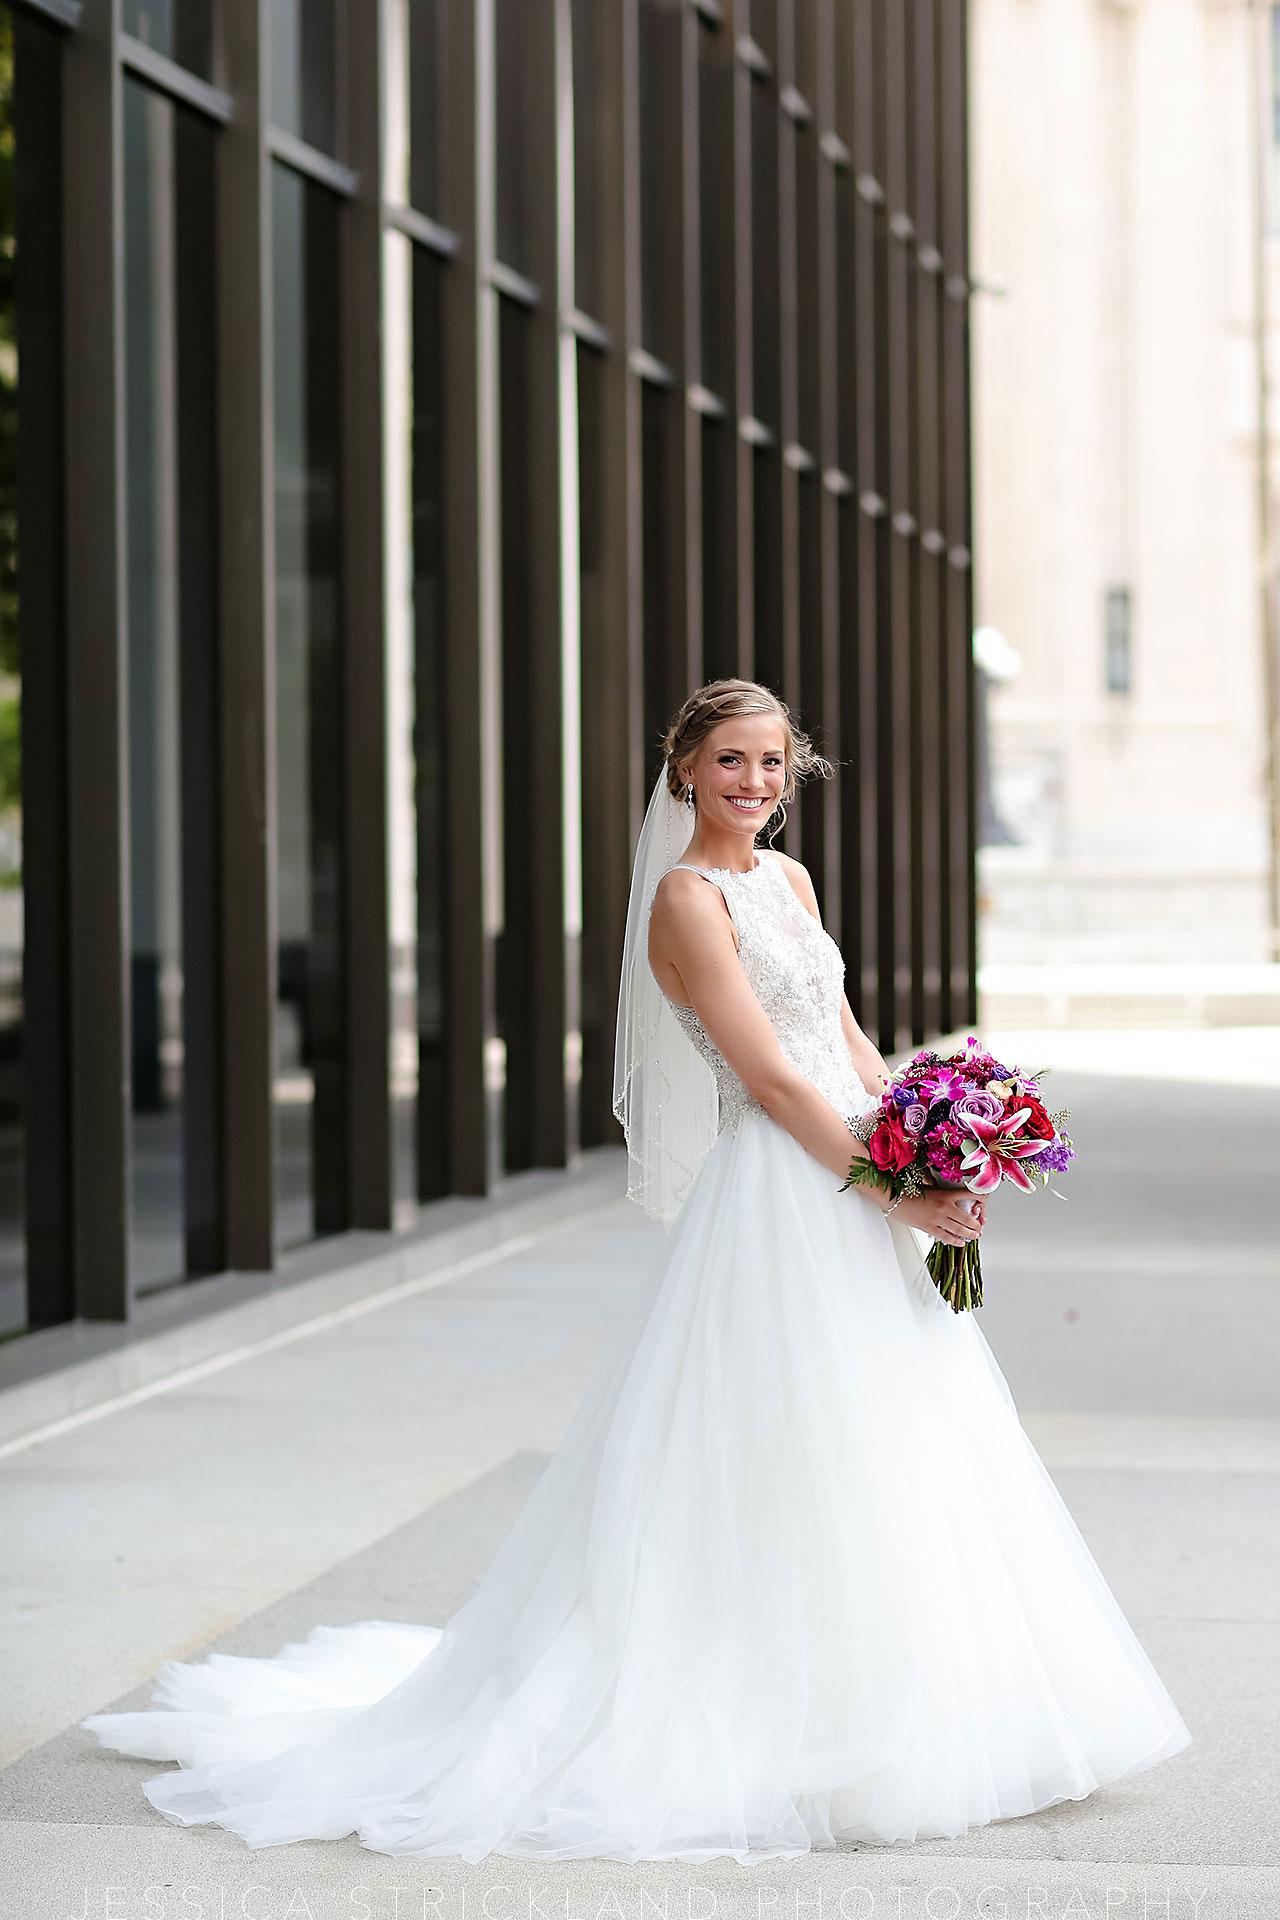 Serra Alex Regions Tower Indianapolis Wedding 071 watermarked